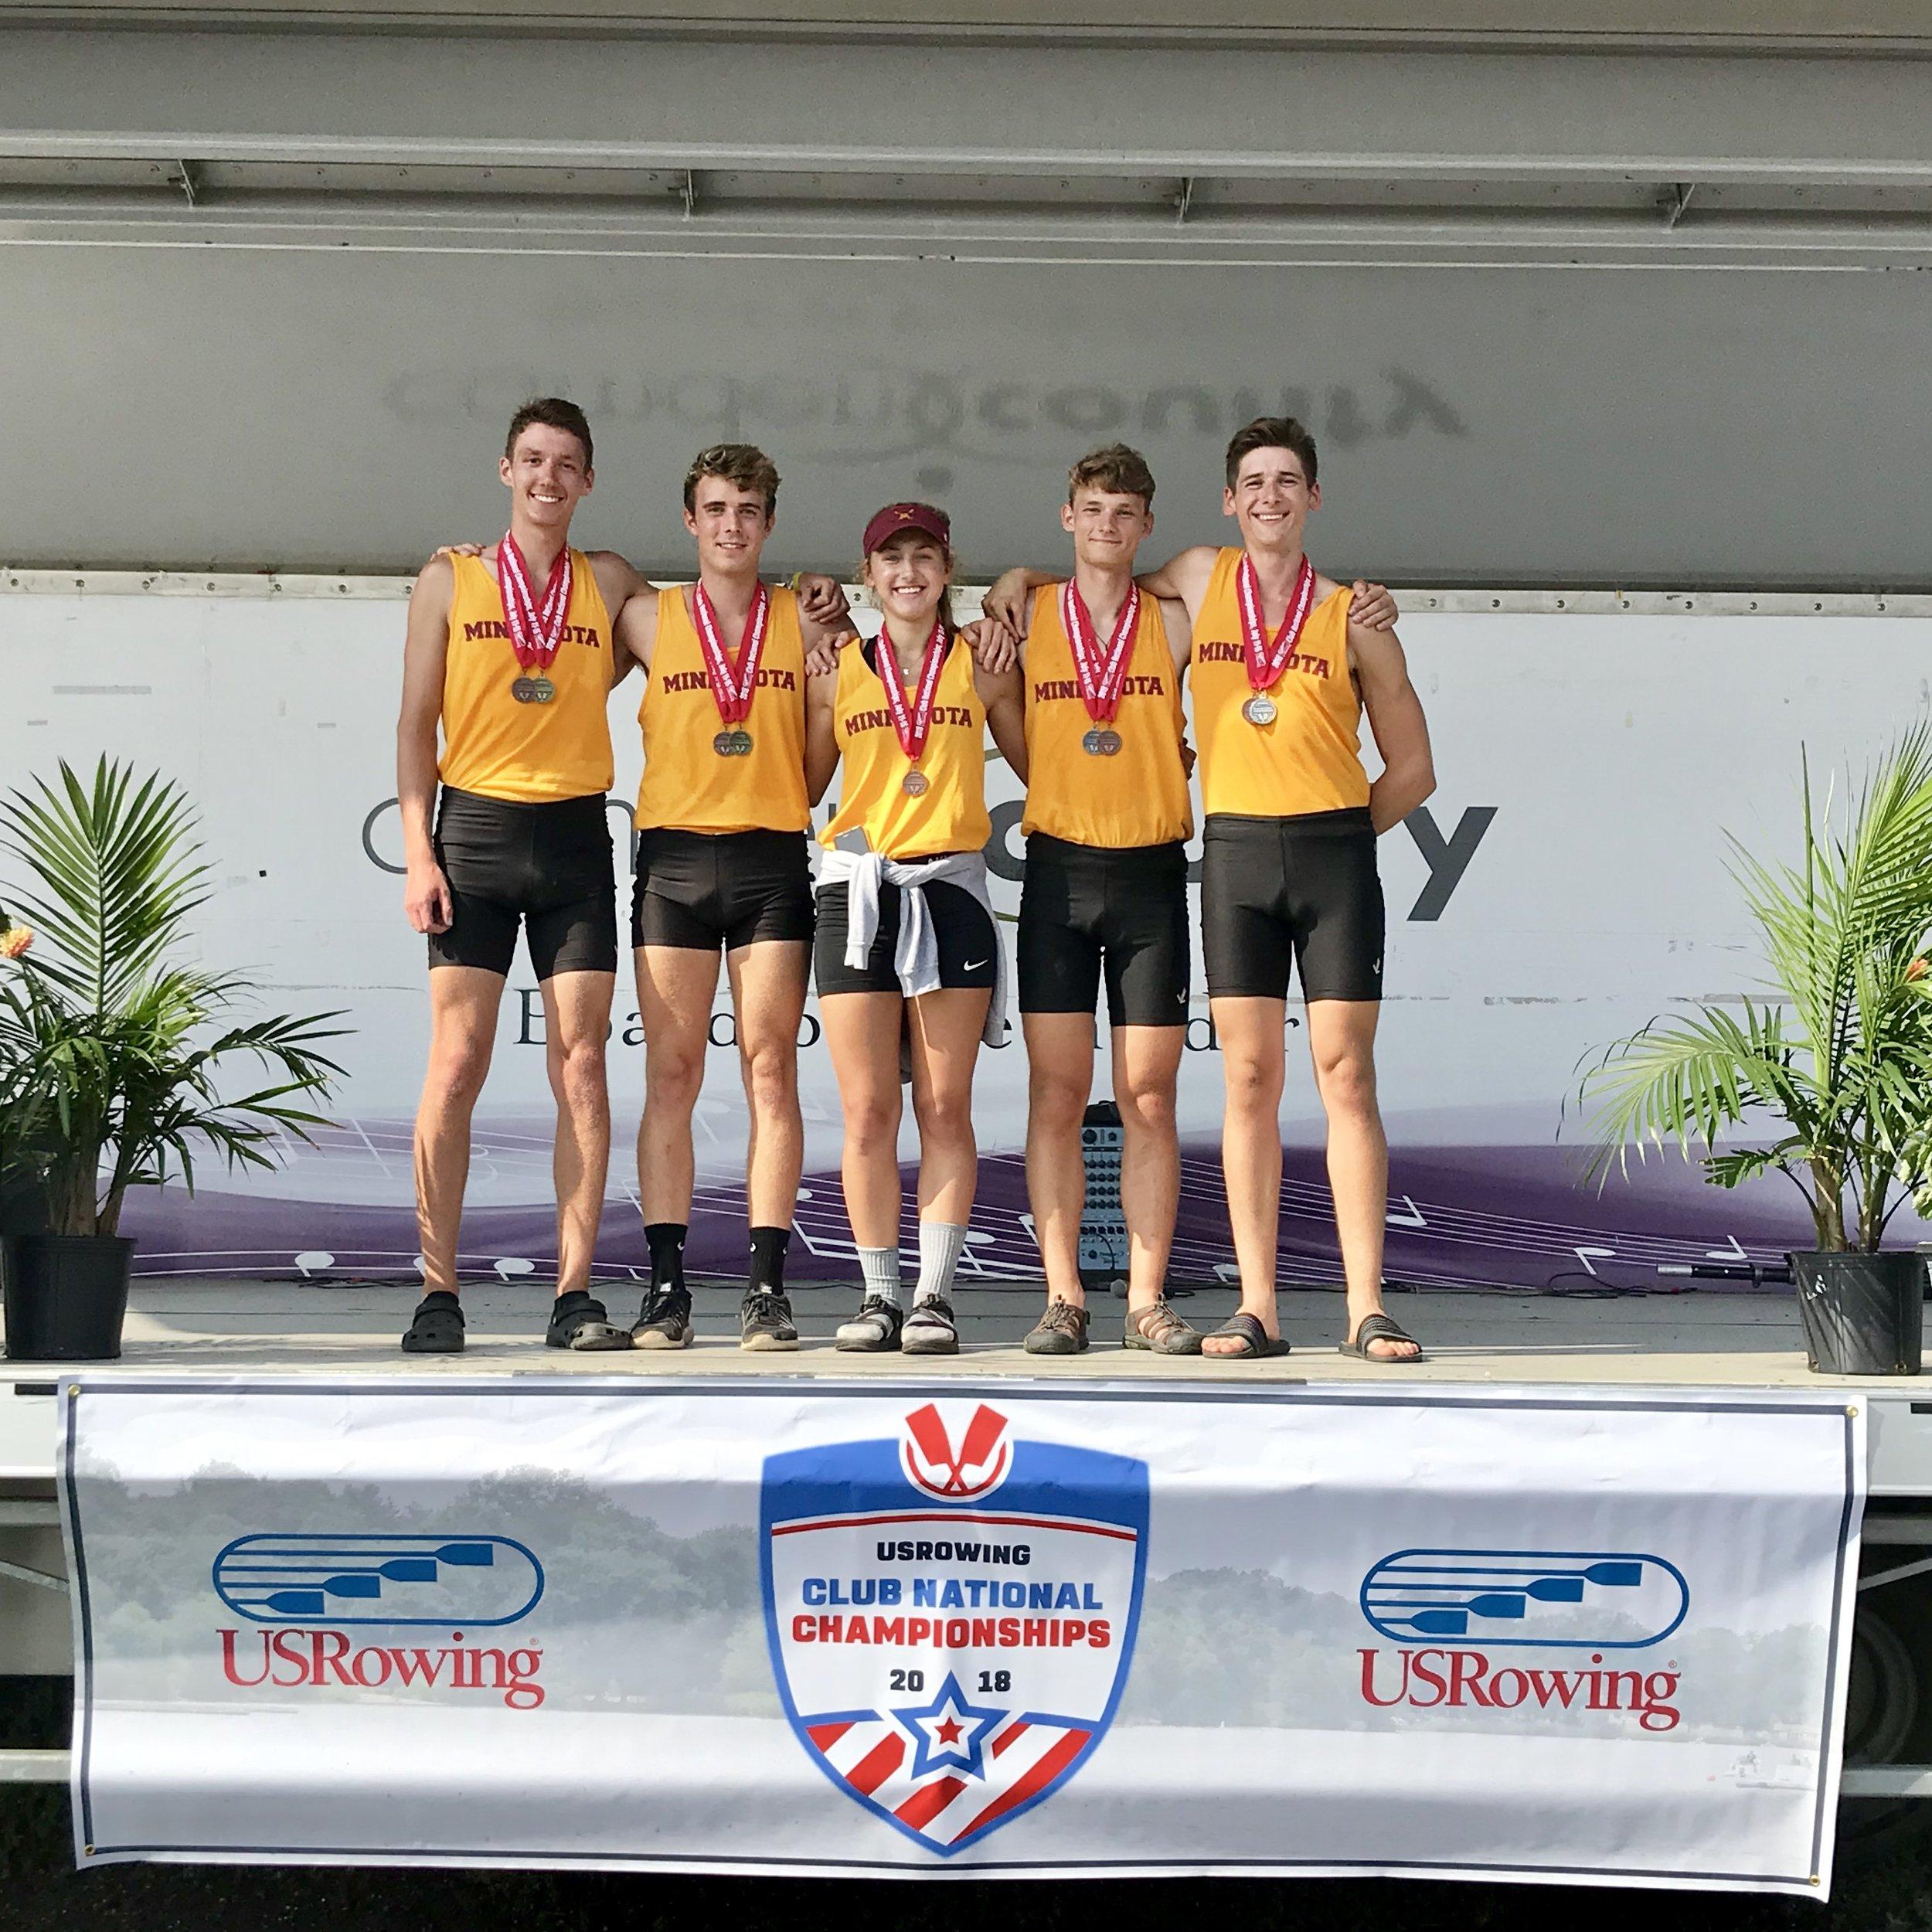 Left to right: Connor Lund ('18), Alexander Martin ('18), Recebba Sedivy ('20), Sean Tardrew ('20), Keiran Peers ('21)